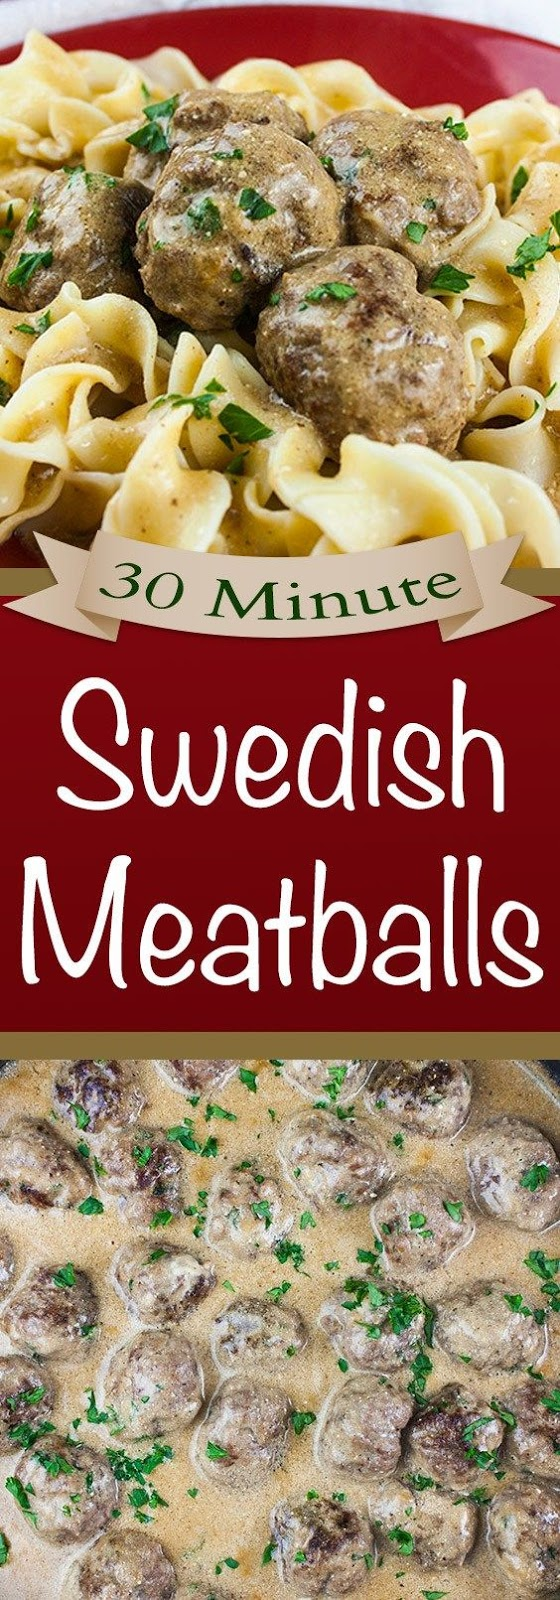 30 Minute Swedish Meatballs